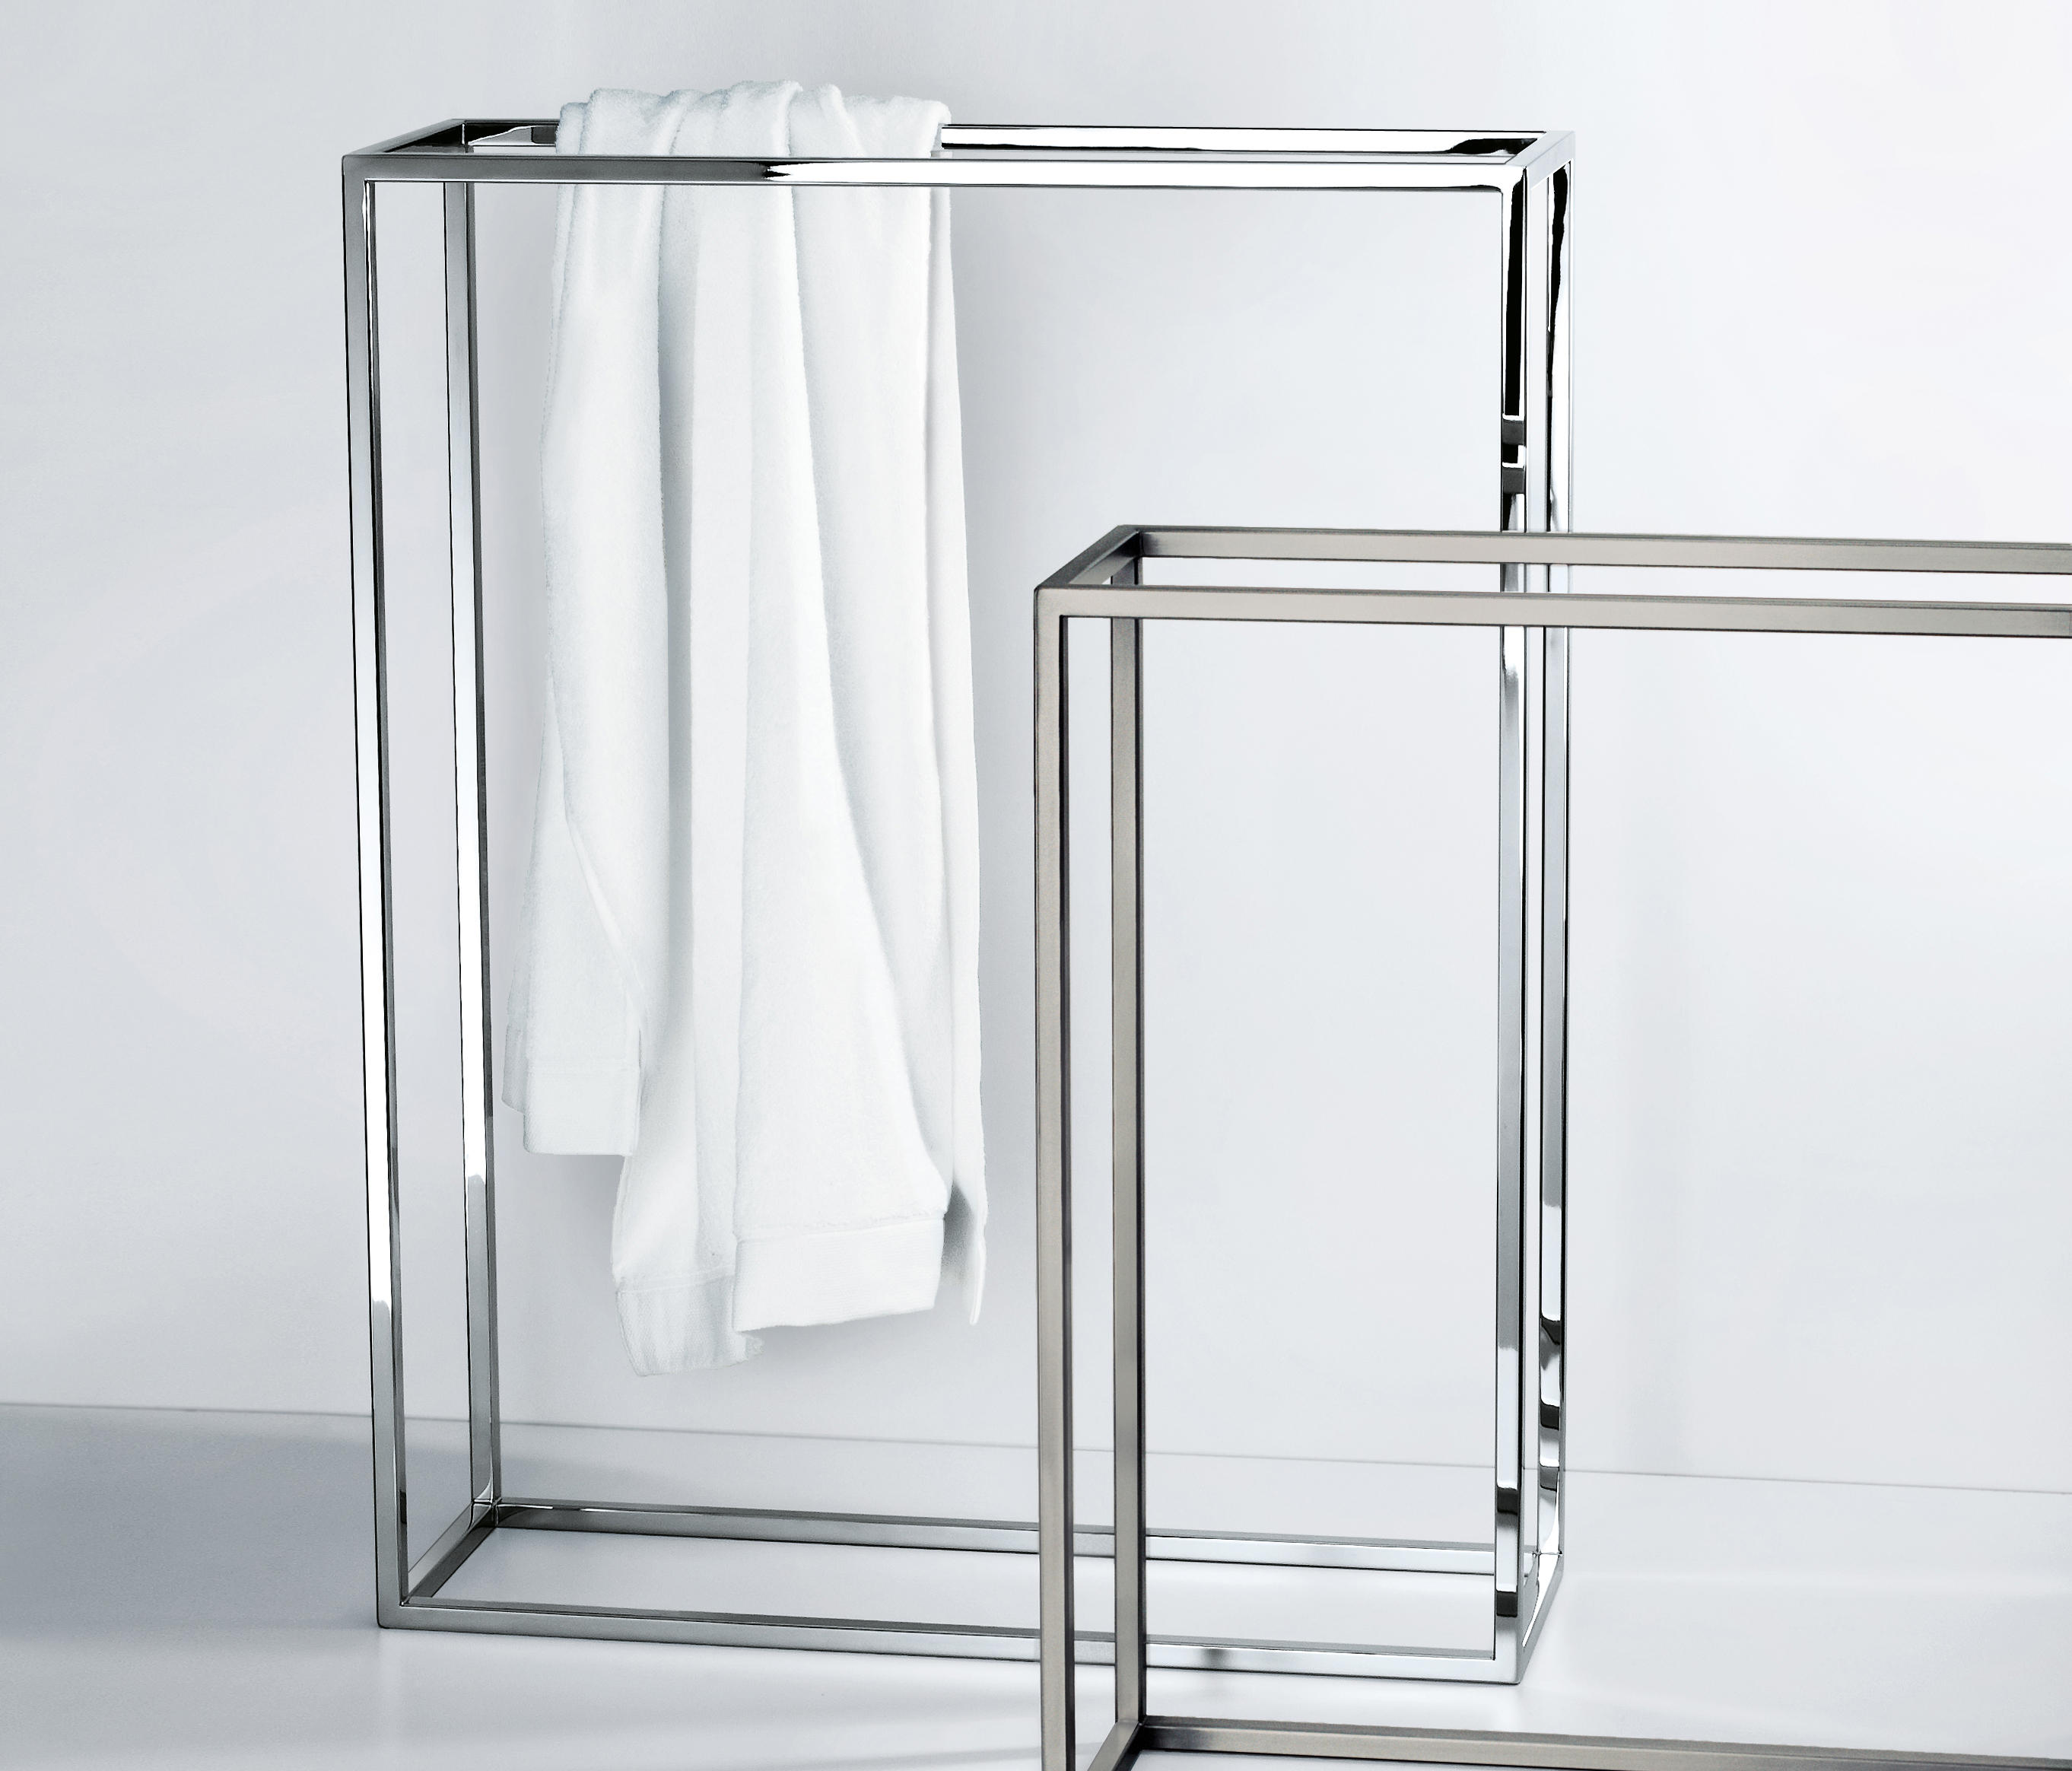 ht 45 handtuchhalter von decor walther architonic. Black Bedroom Furniture Sets. Home Design Ideas